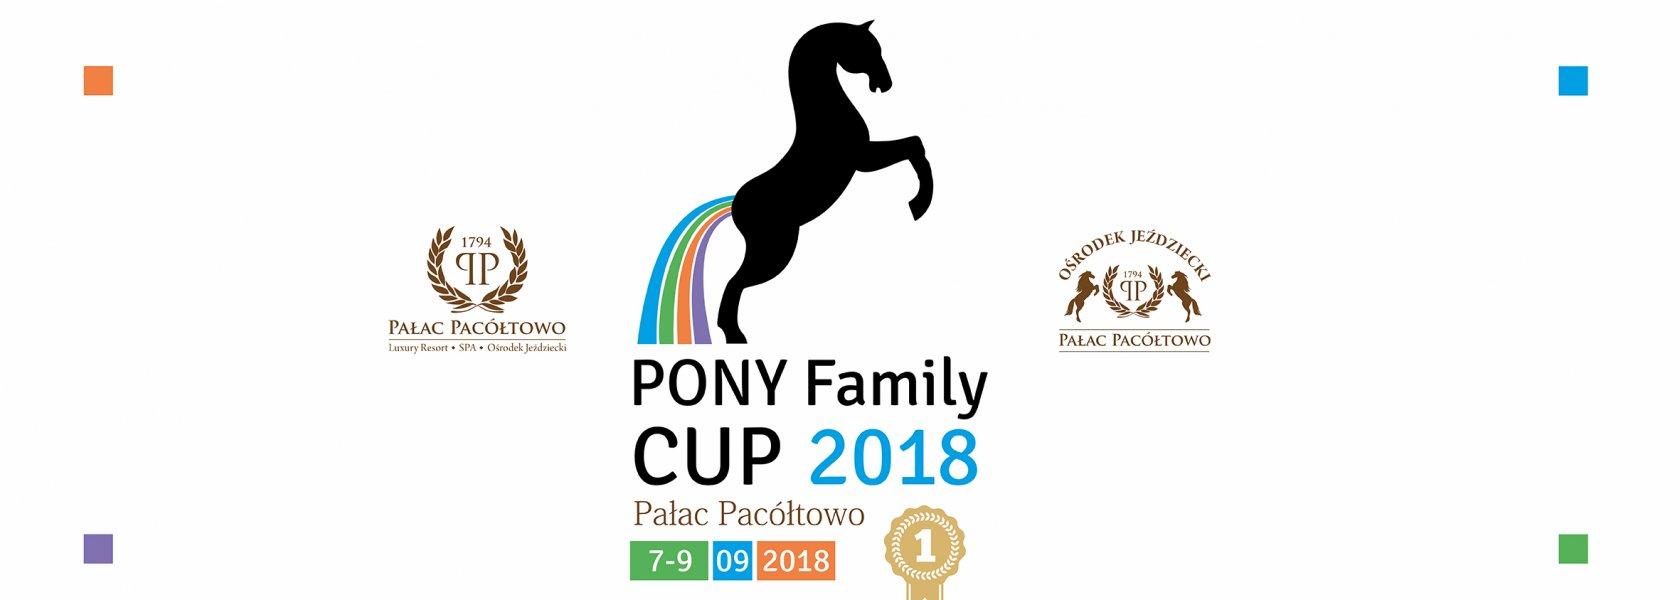 Pony Cup 2018